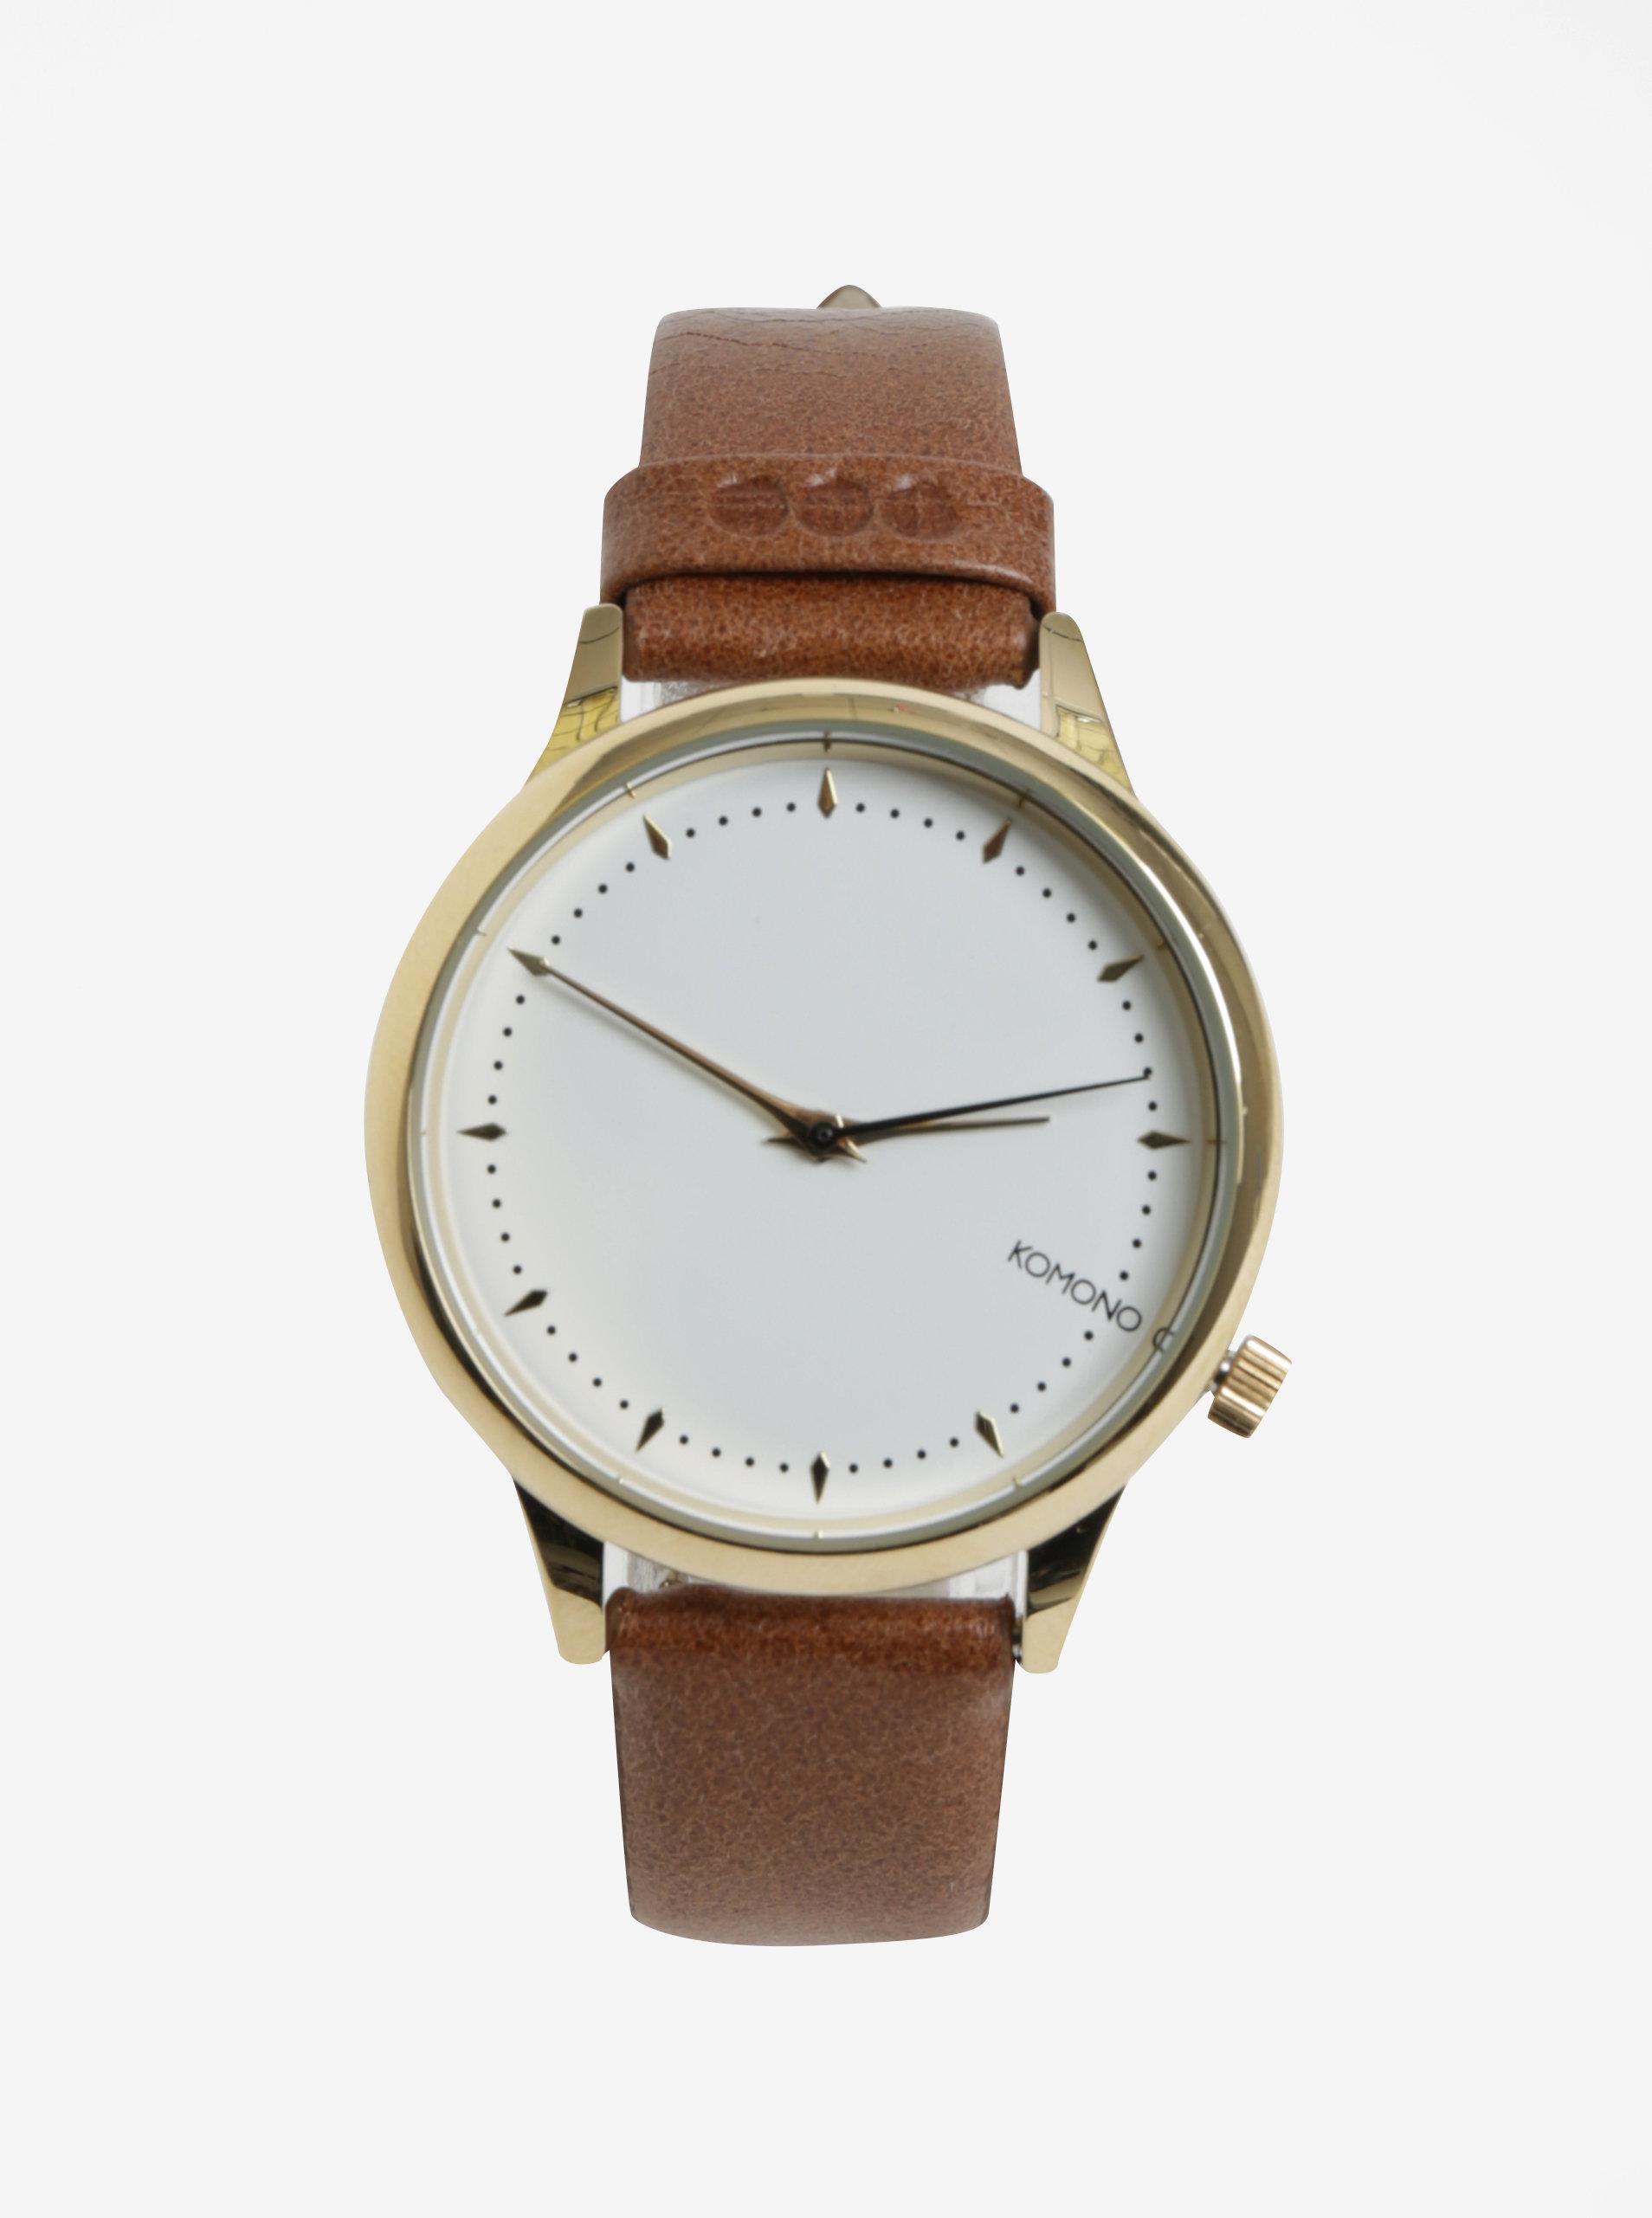 0e4e18ec3e0 Bílo-černé dámské hodinky s kovovým páskem Komono Estelle Royale ...